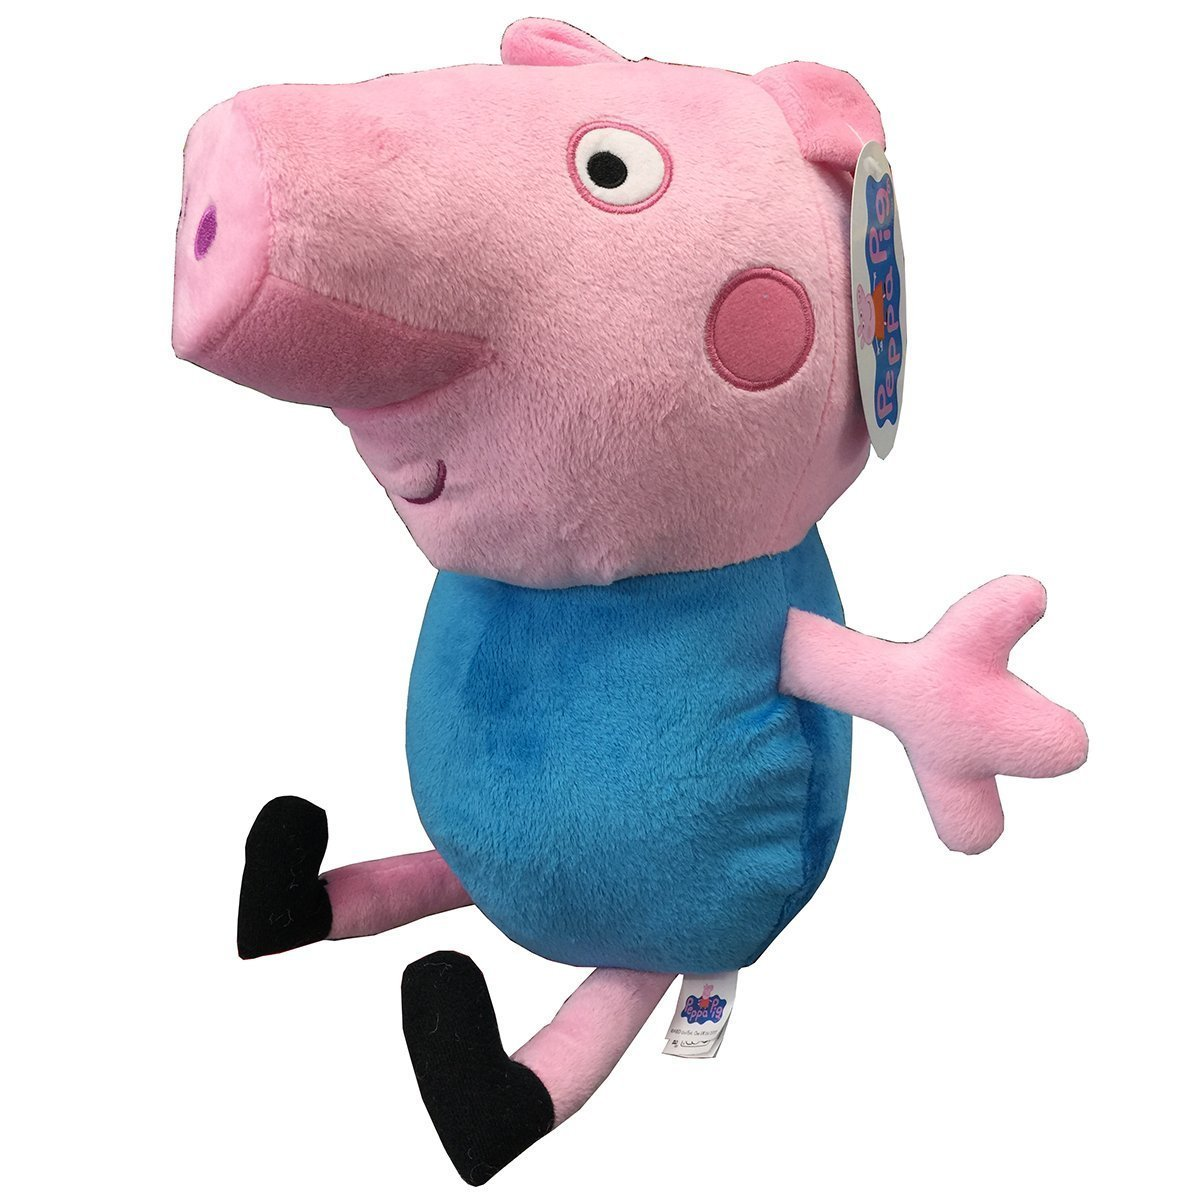 "19.5"" Plush Doll -Blue Pants By Peppa Pig"